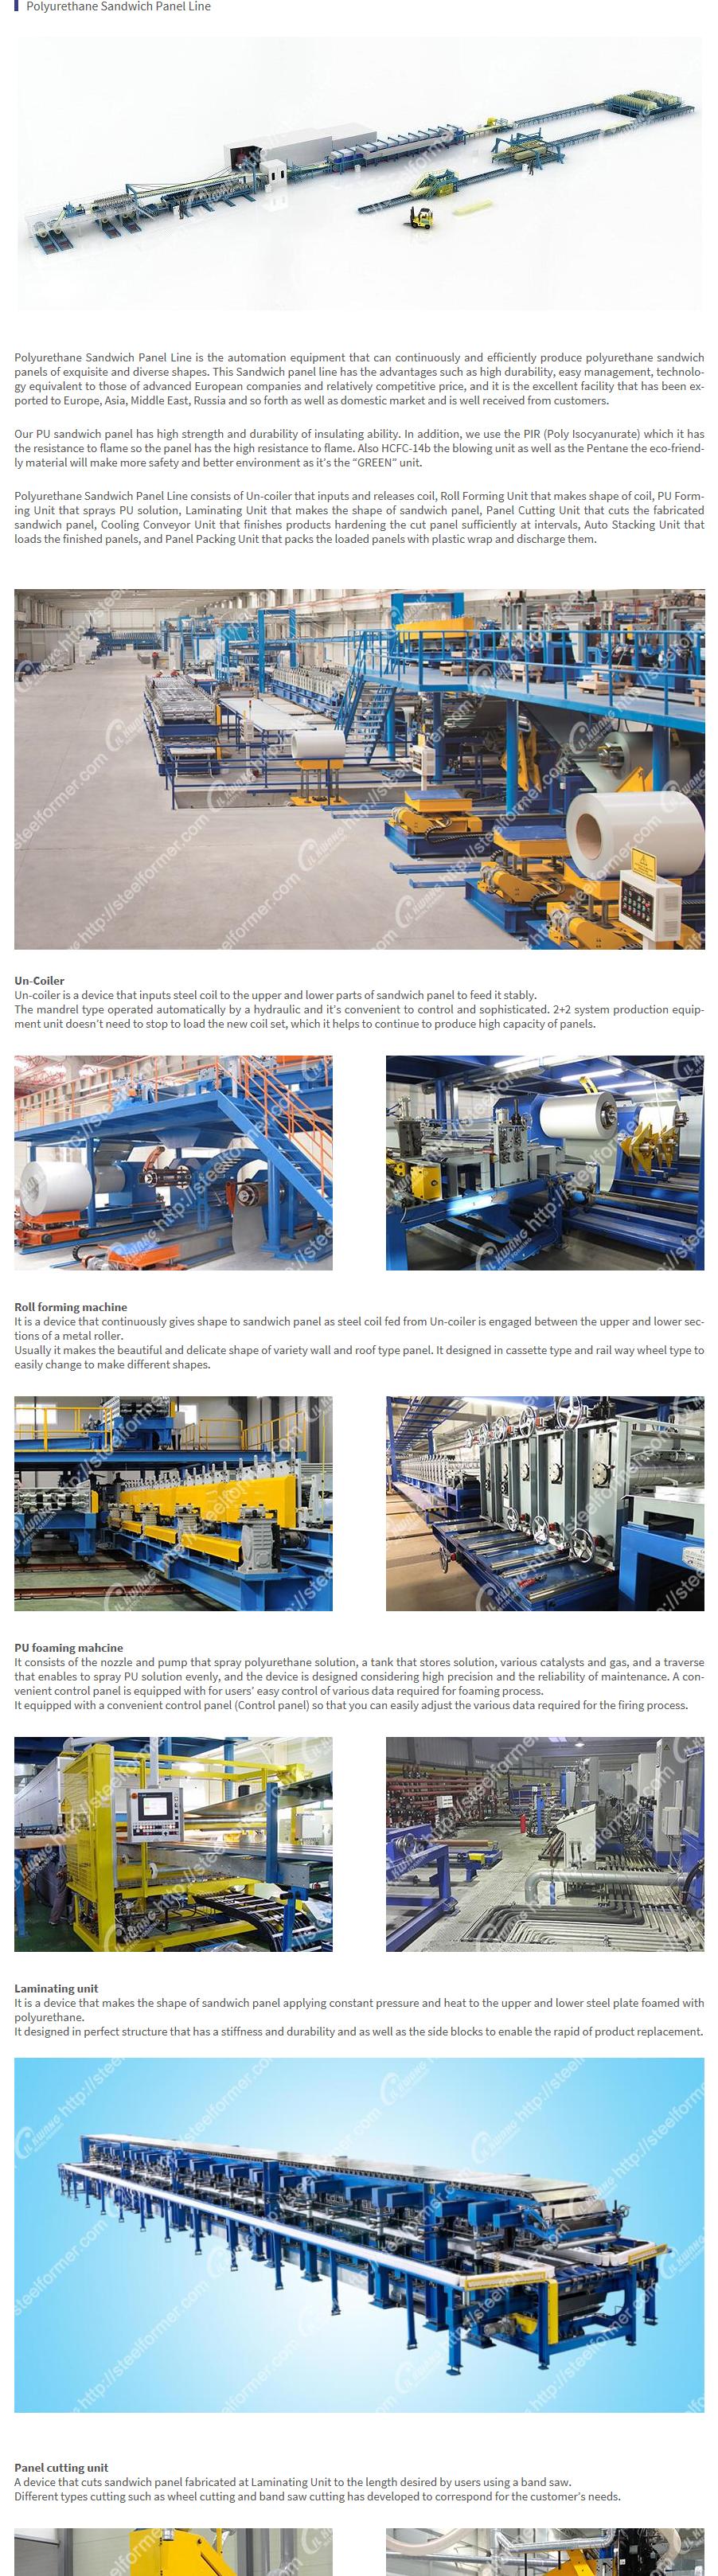 ILKWANG Metal Forming - Polyurethane sandwich panel line